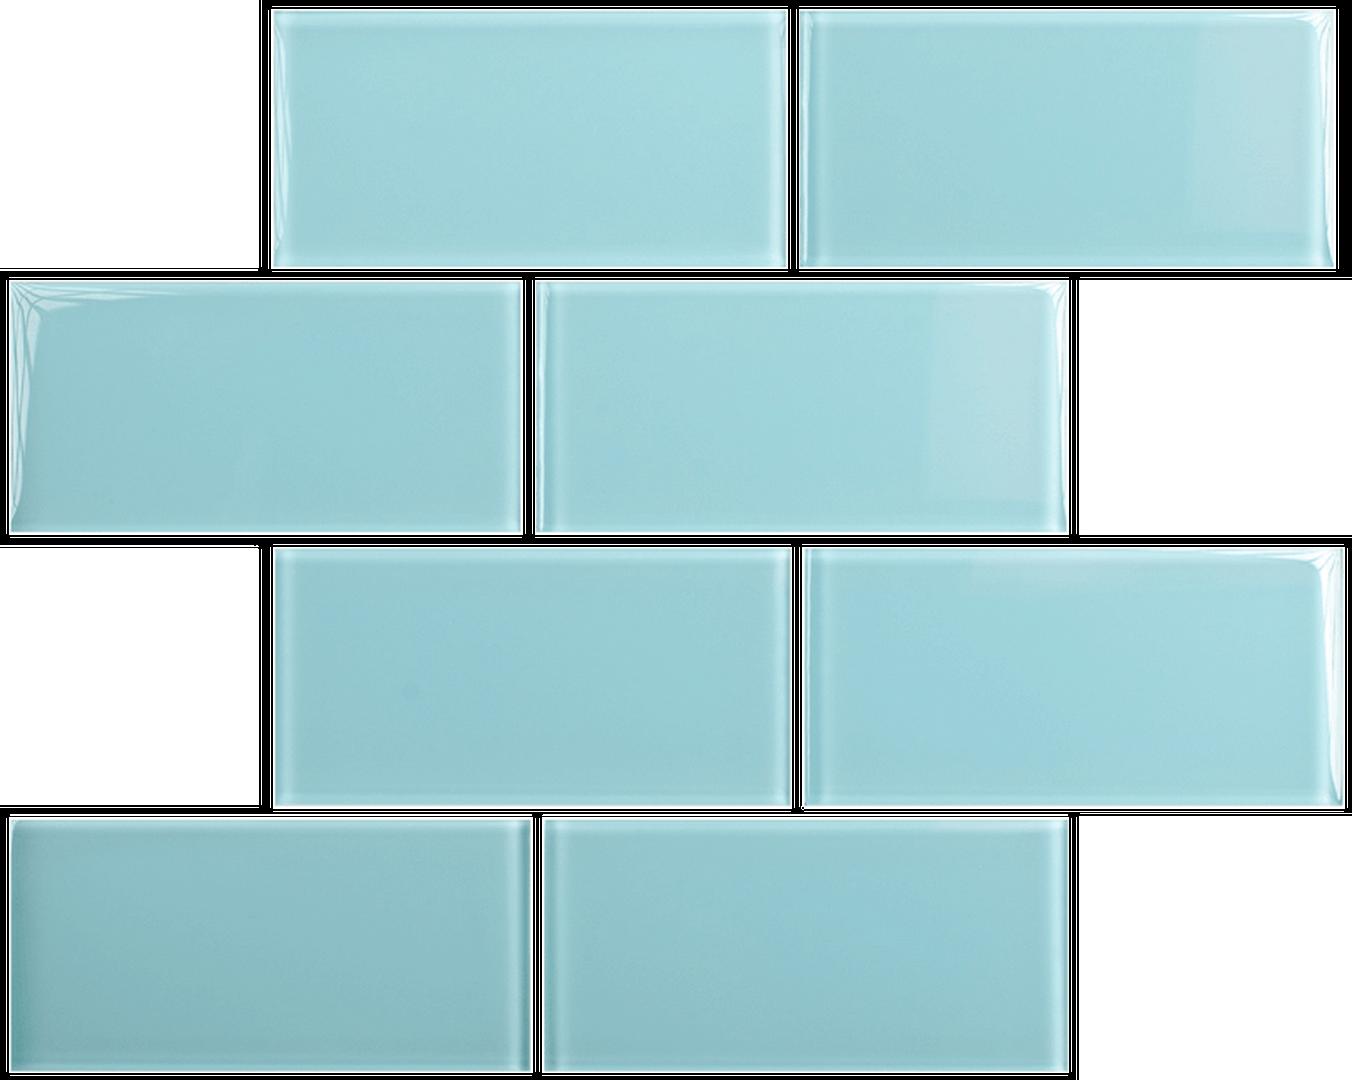 Crystal 3 x 6 Subway Tiles Sky Blue